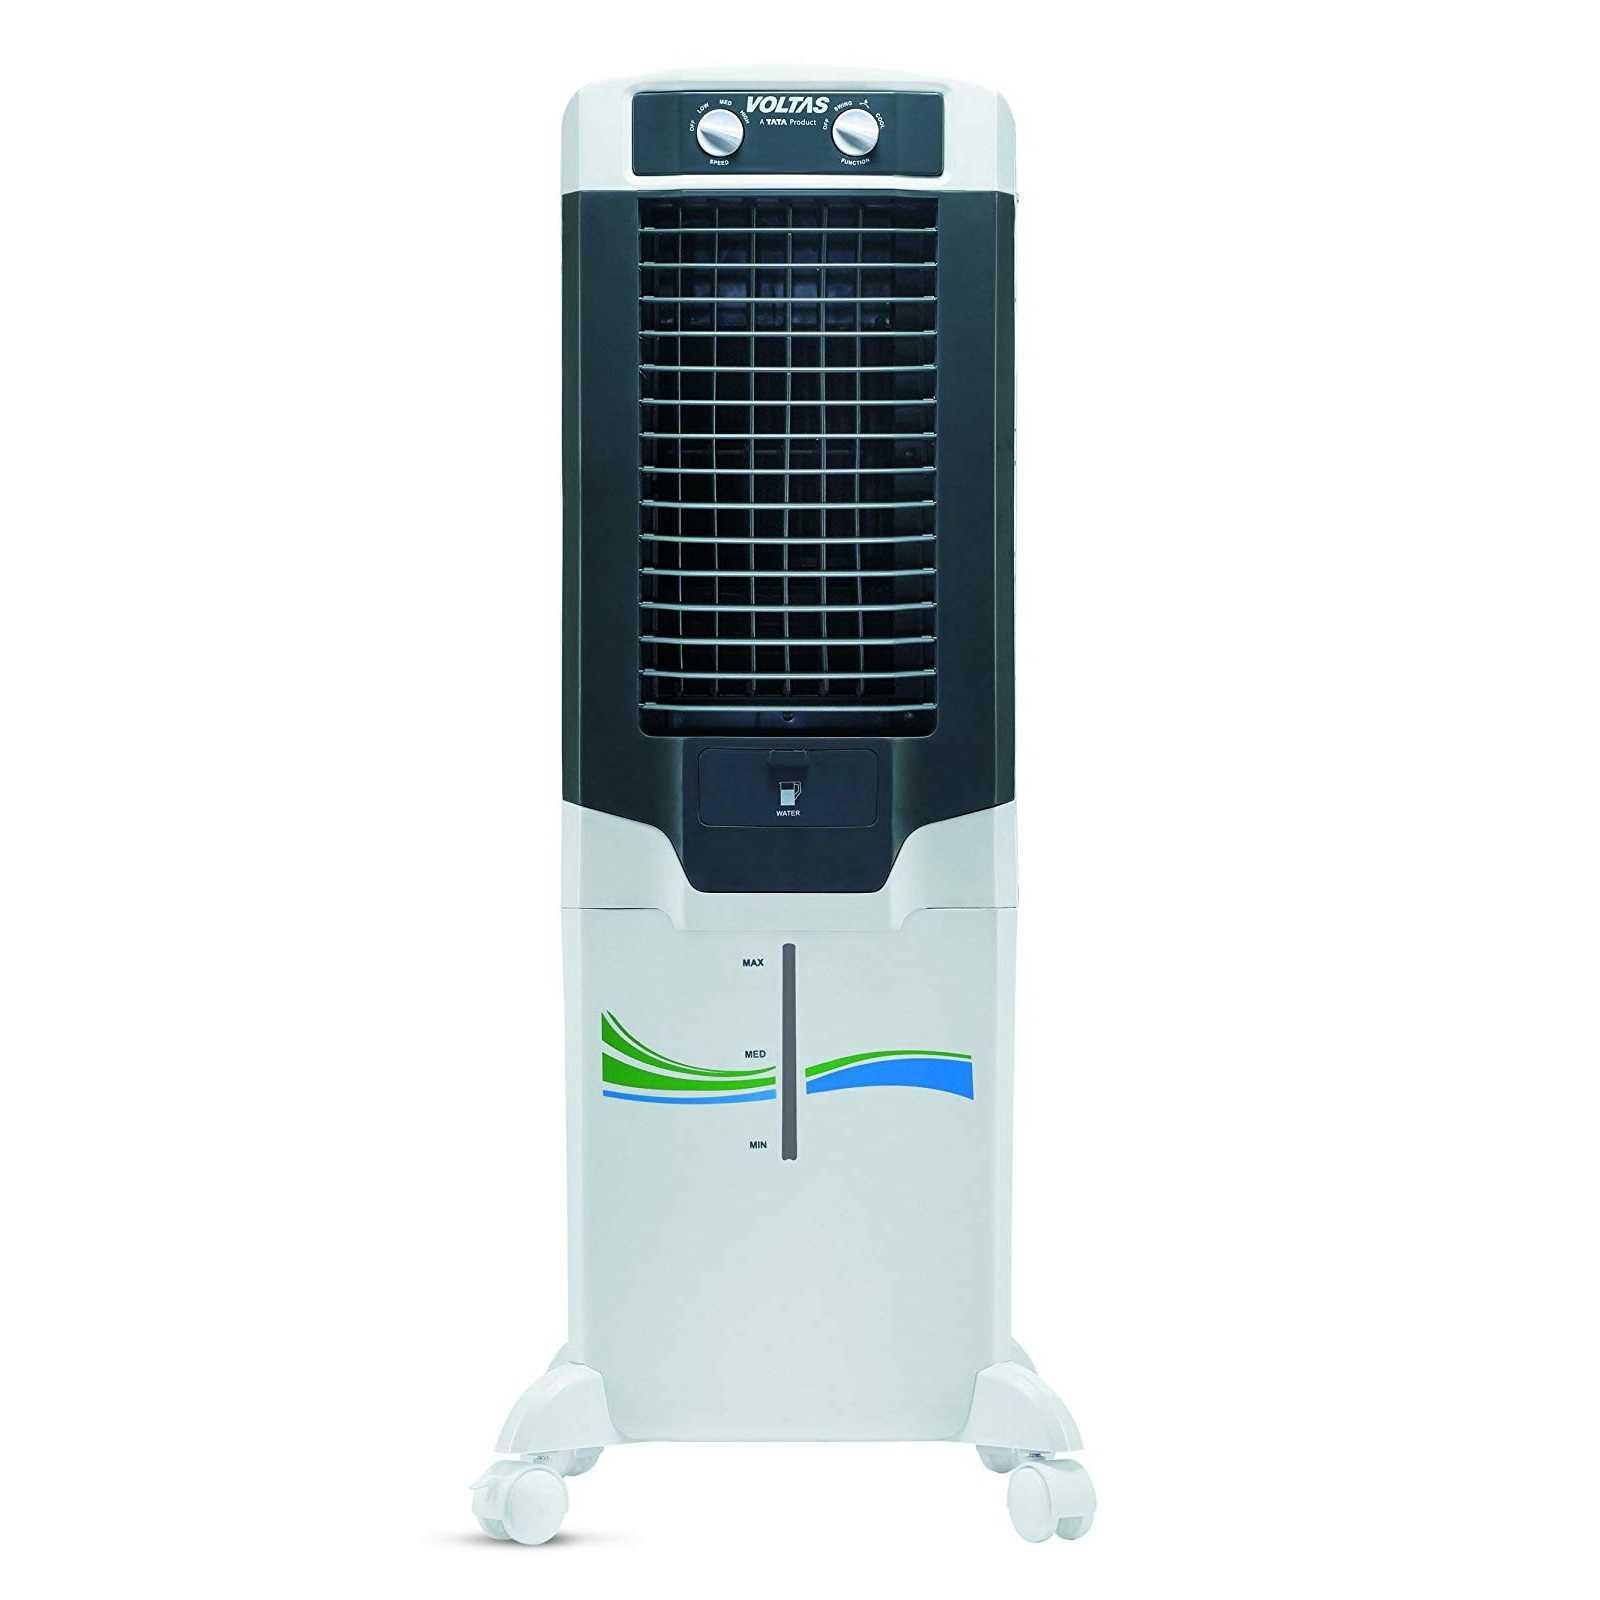 Voltas VM T25MH 25 Litres Tower Air Cooler